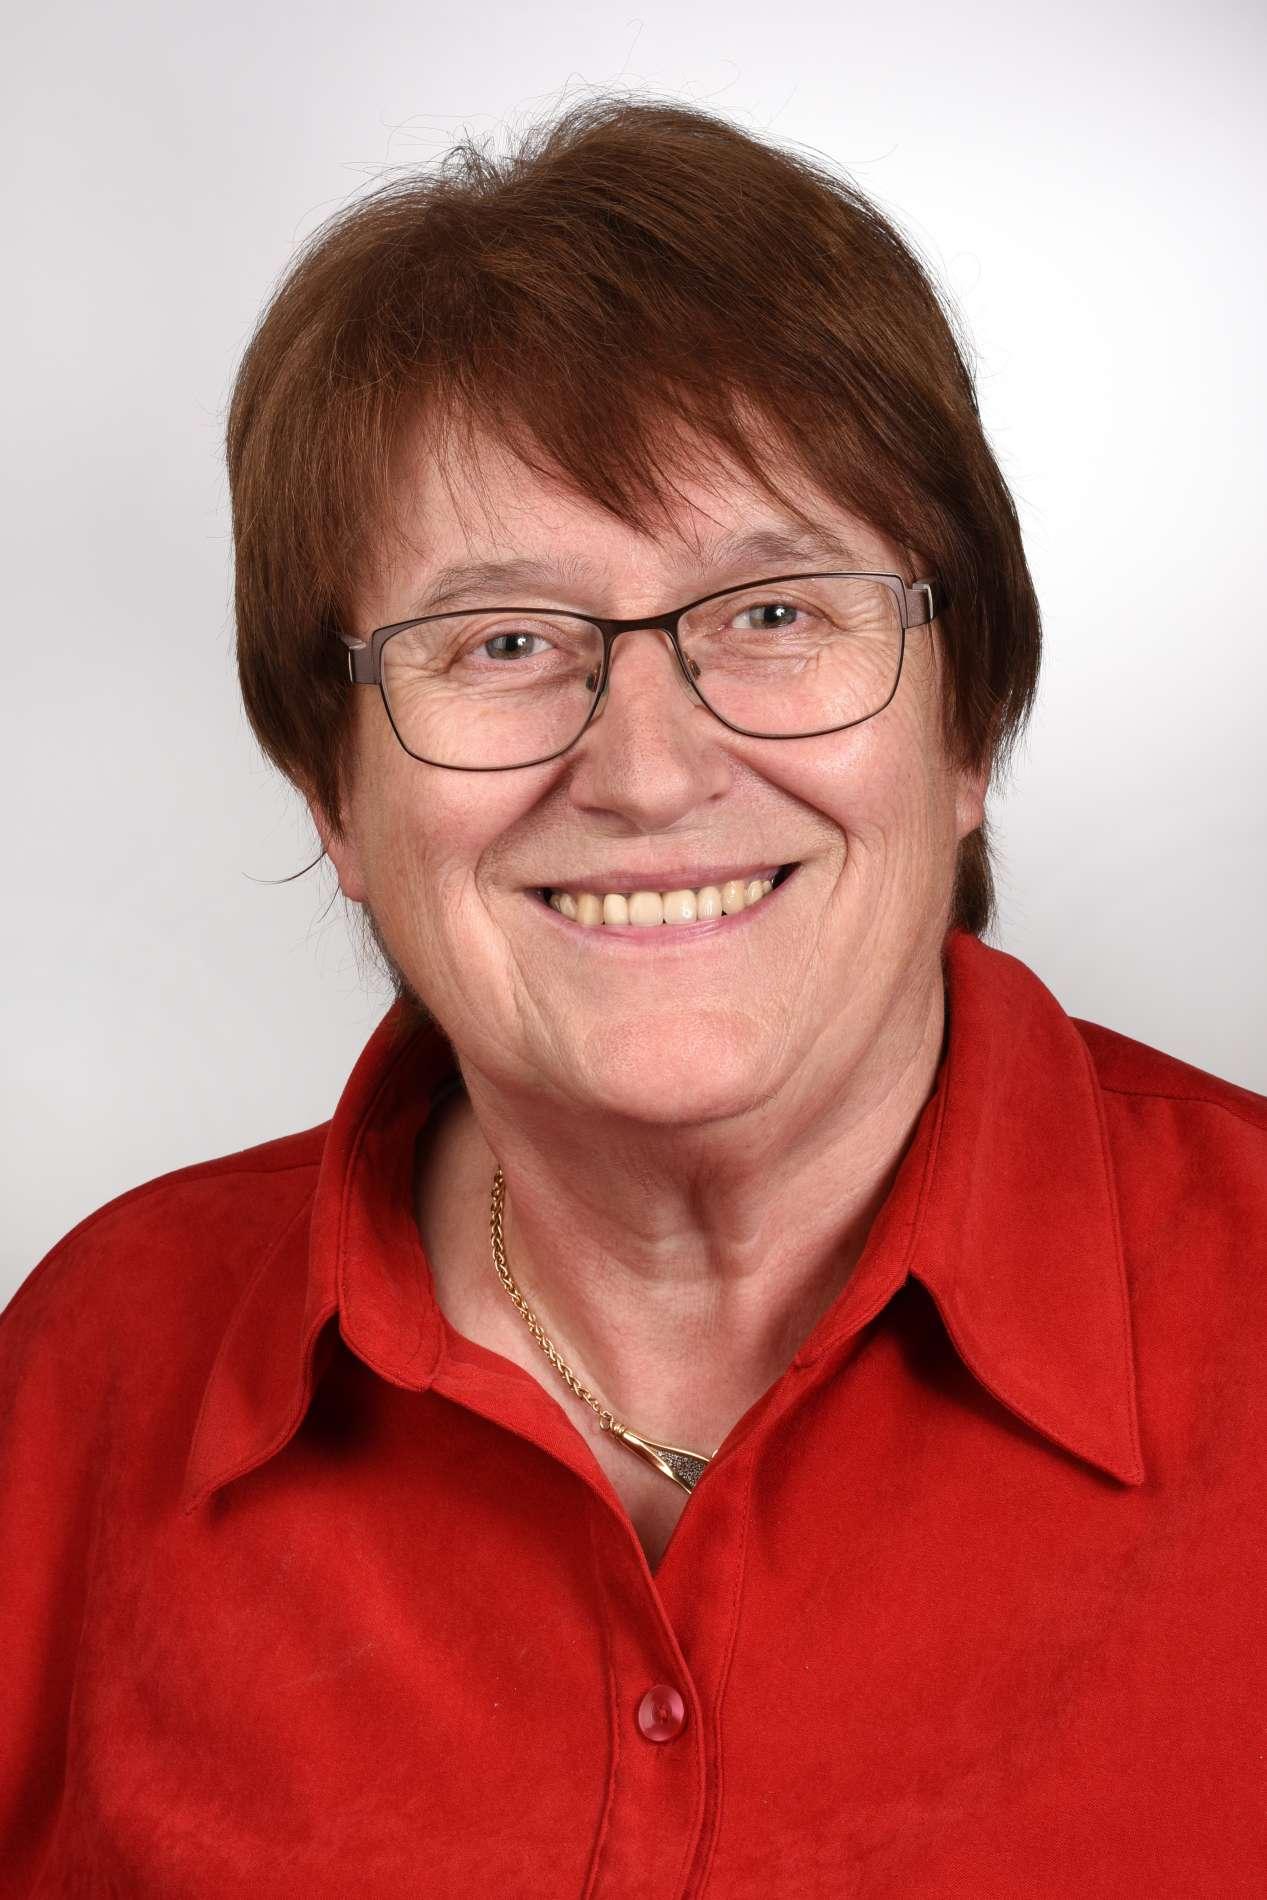 Herta Bender